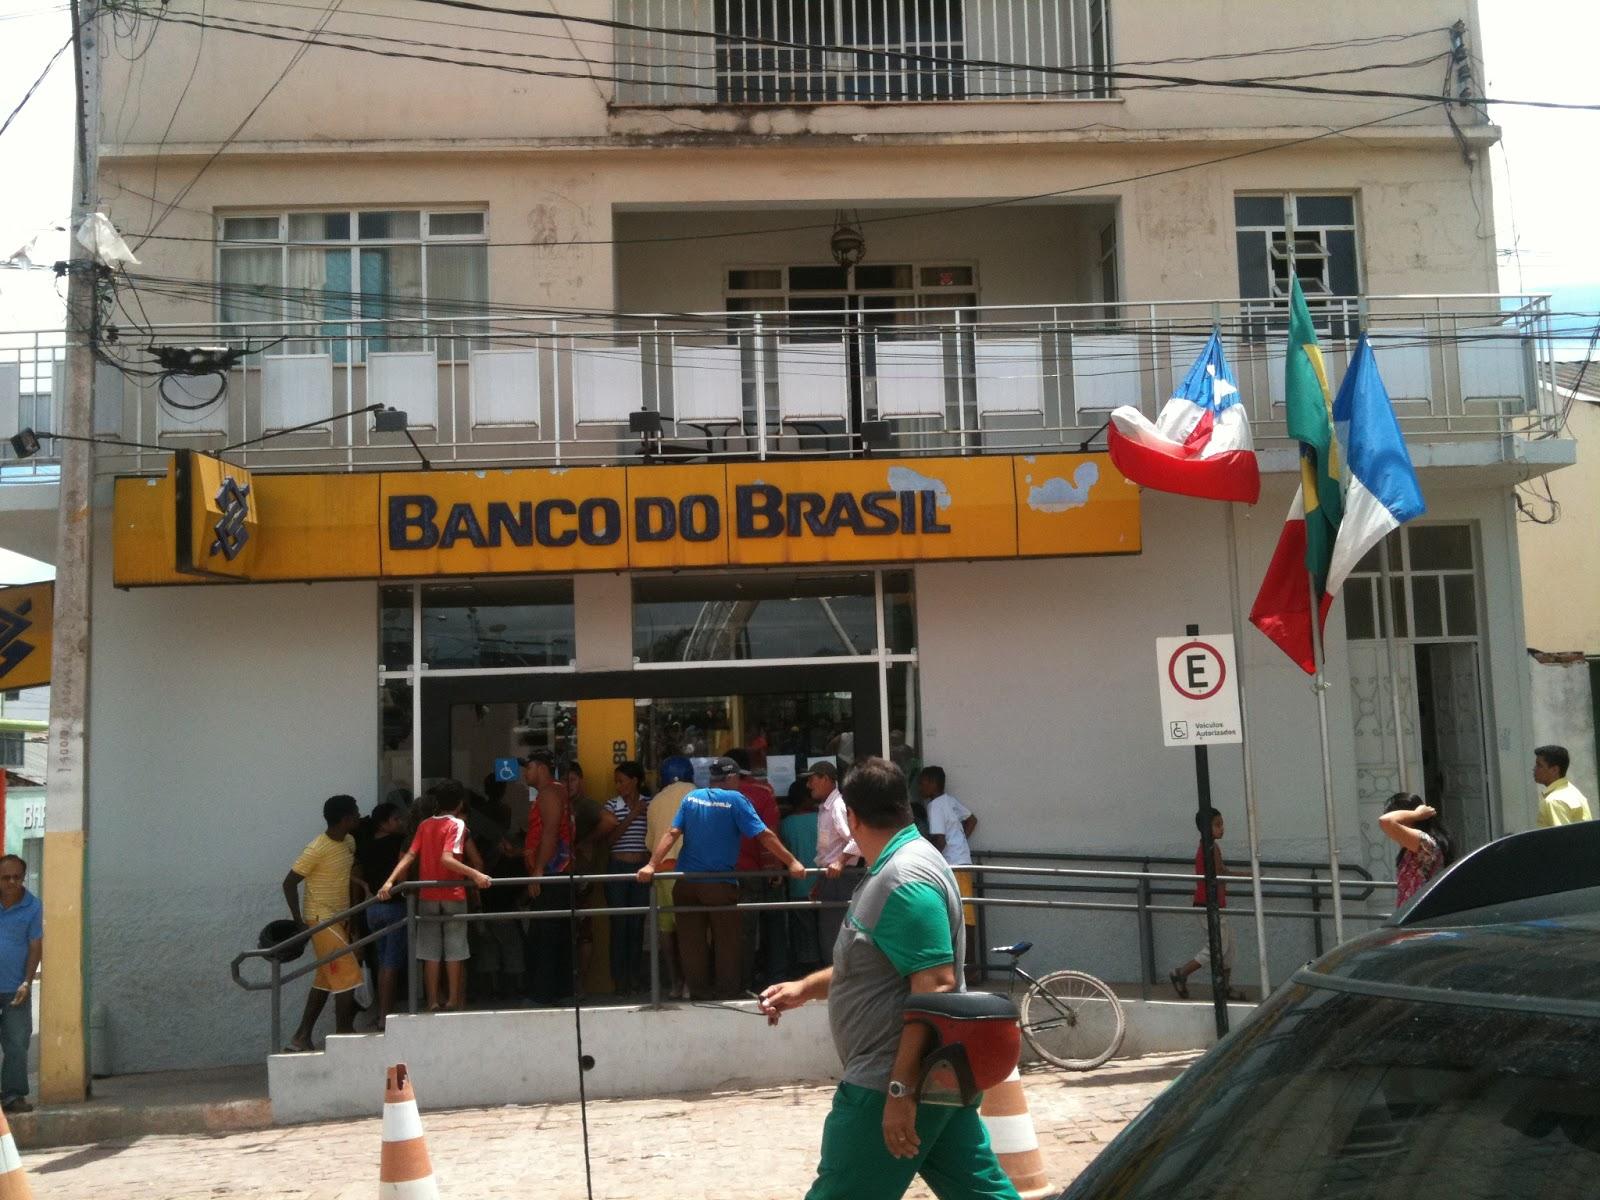 http://2.bp.blogspot.com/_xrWxhaH_Ks8/TSYAnAOUv9I/AAAAAAAACD8/jIXAZC5HmfI/s1600/banco_do_brasil_barra_da_estiva.jpg